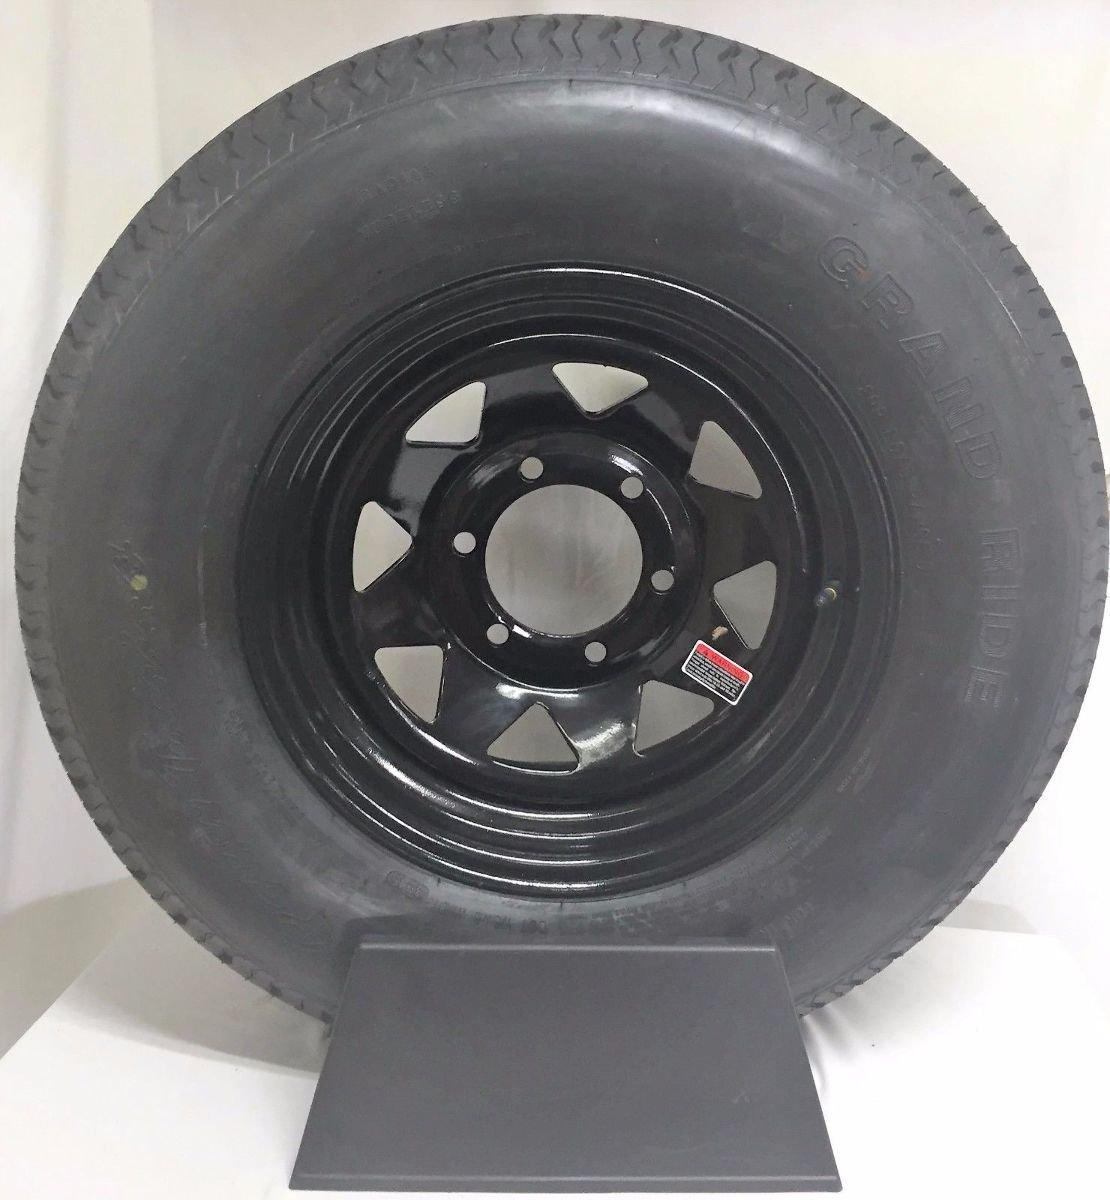 15'' UTILITY BOAT TRAILER WHEEL TIRE NEW BLACK SPOKE 6 LUG st225/75R15 10 PLY